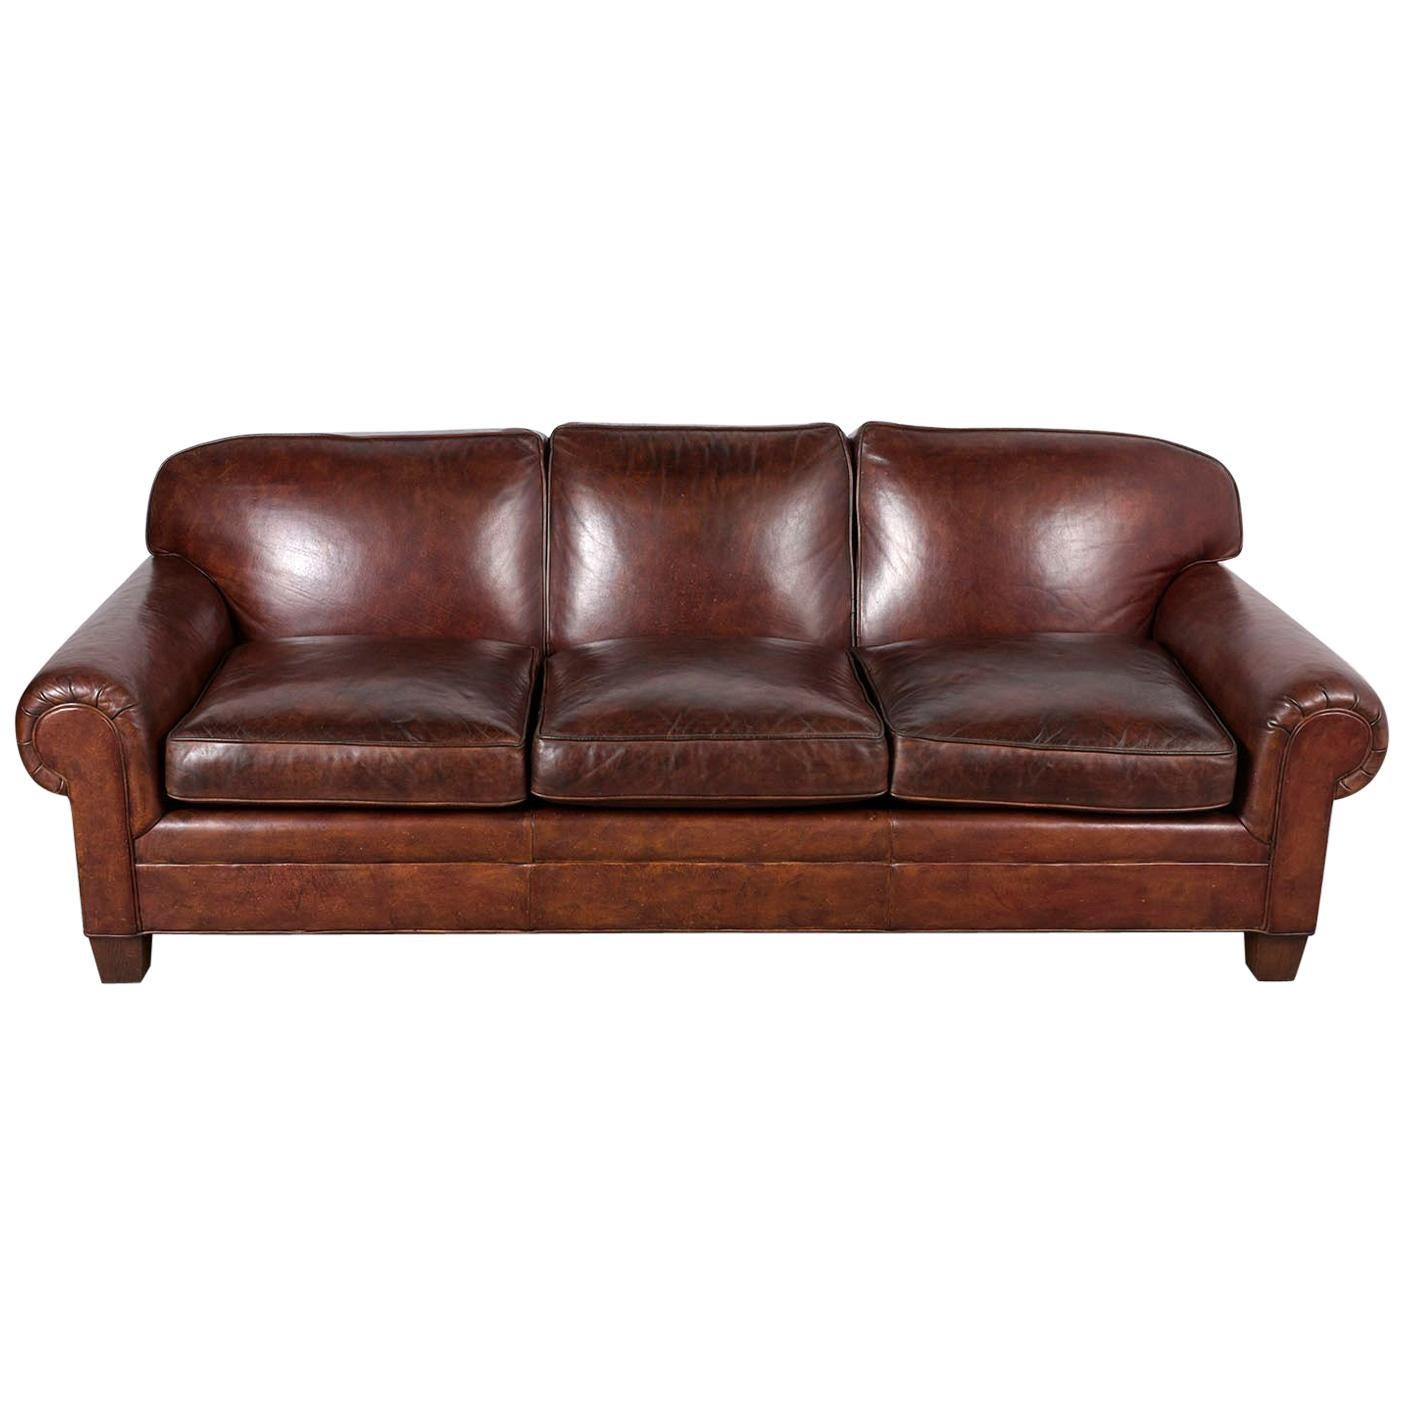 Restored Ralph Lauren Leather Sofa For Sale